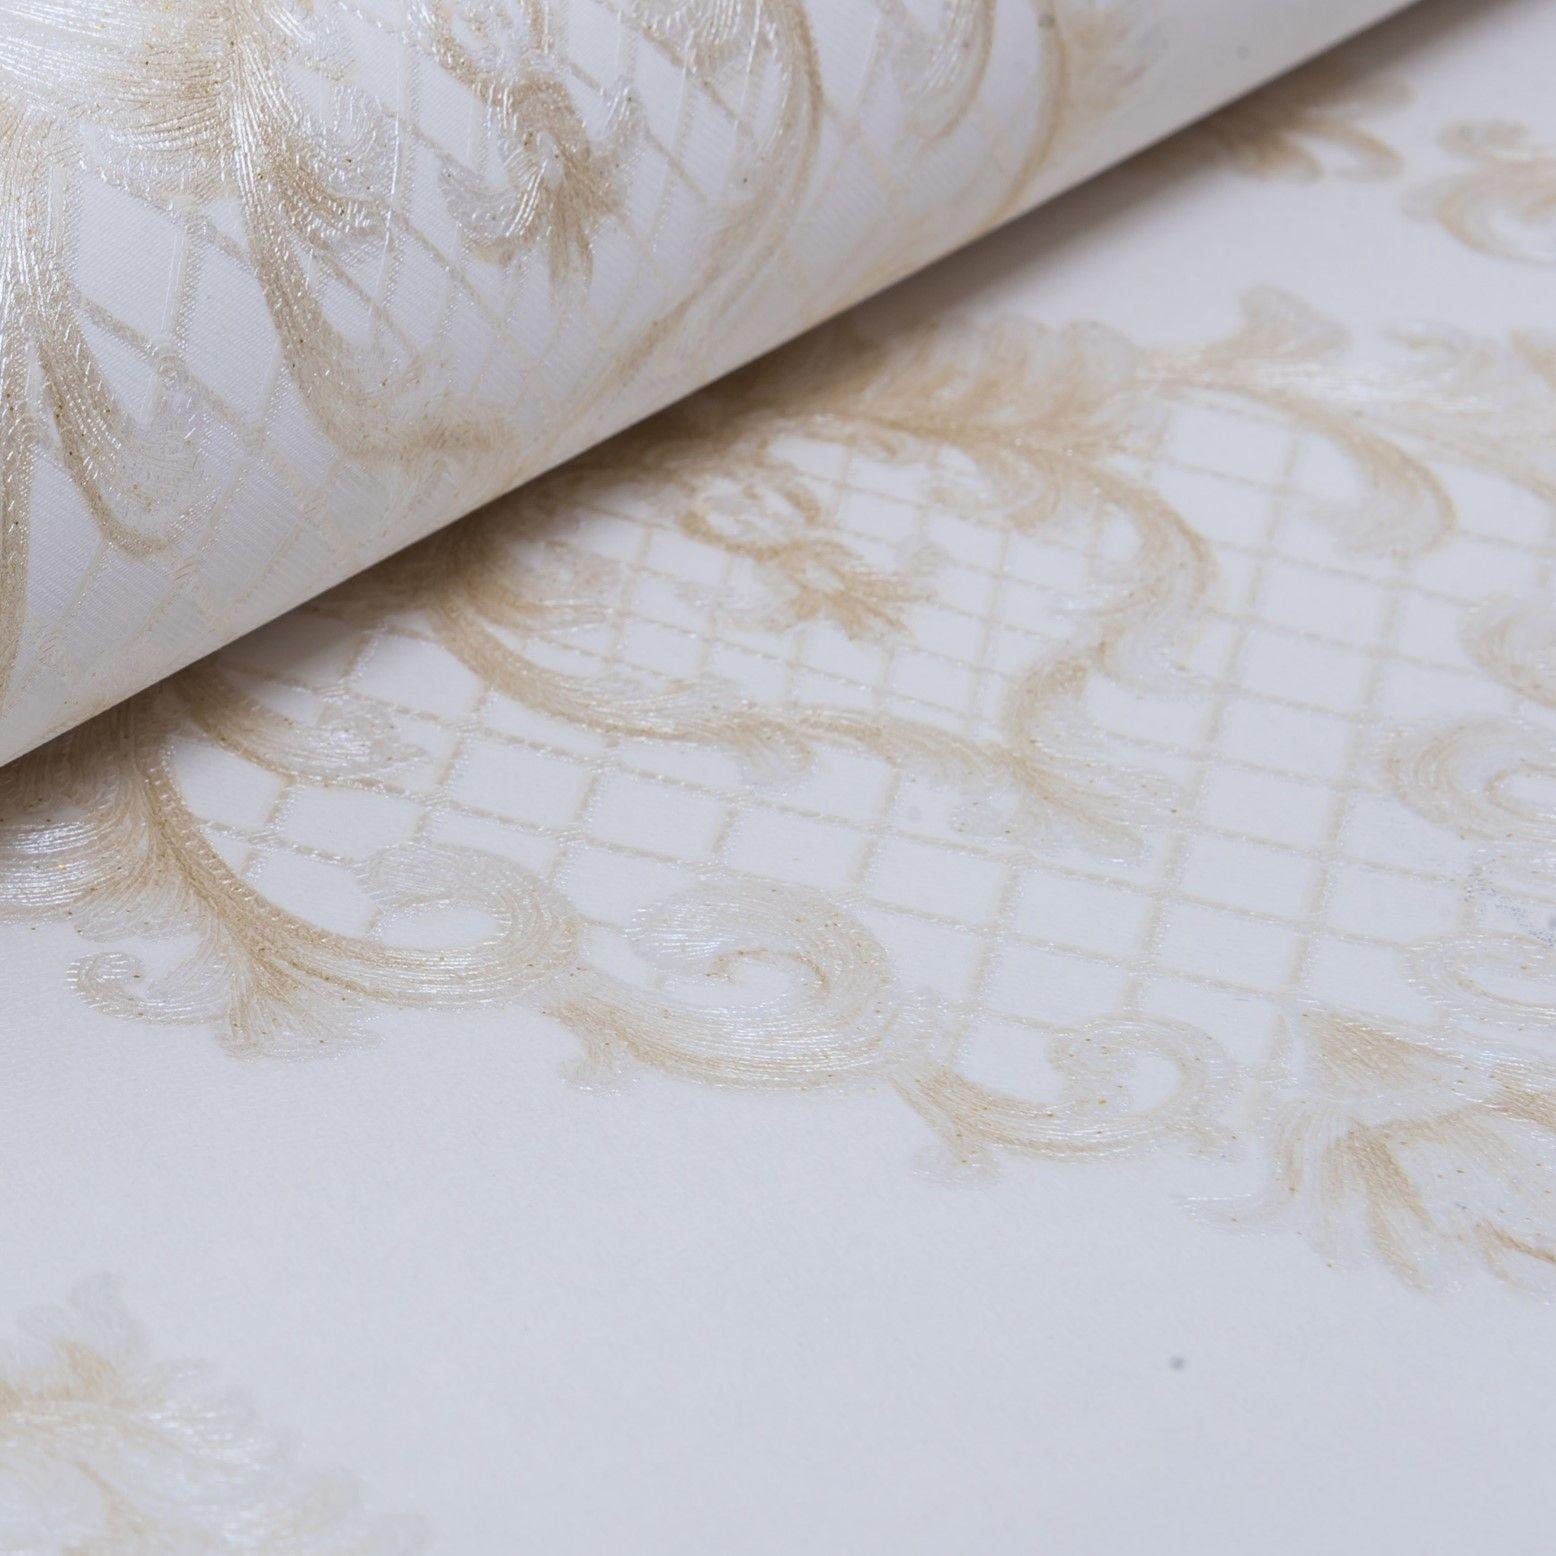 Papel de Parede Paris Decor Vinílico Coleção Chamonix Damask Off White, Bege